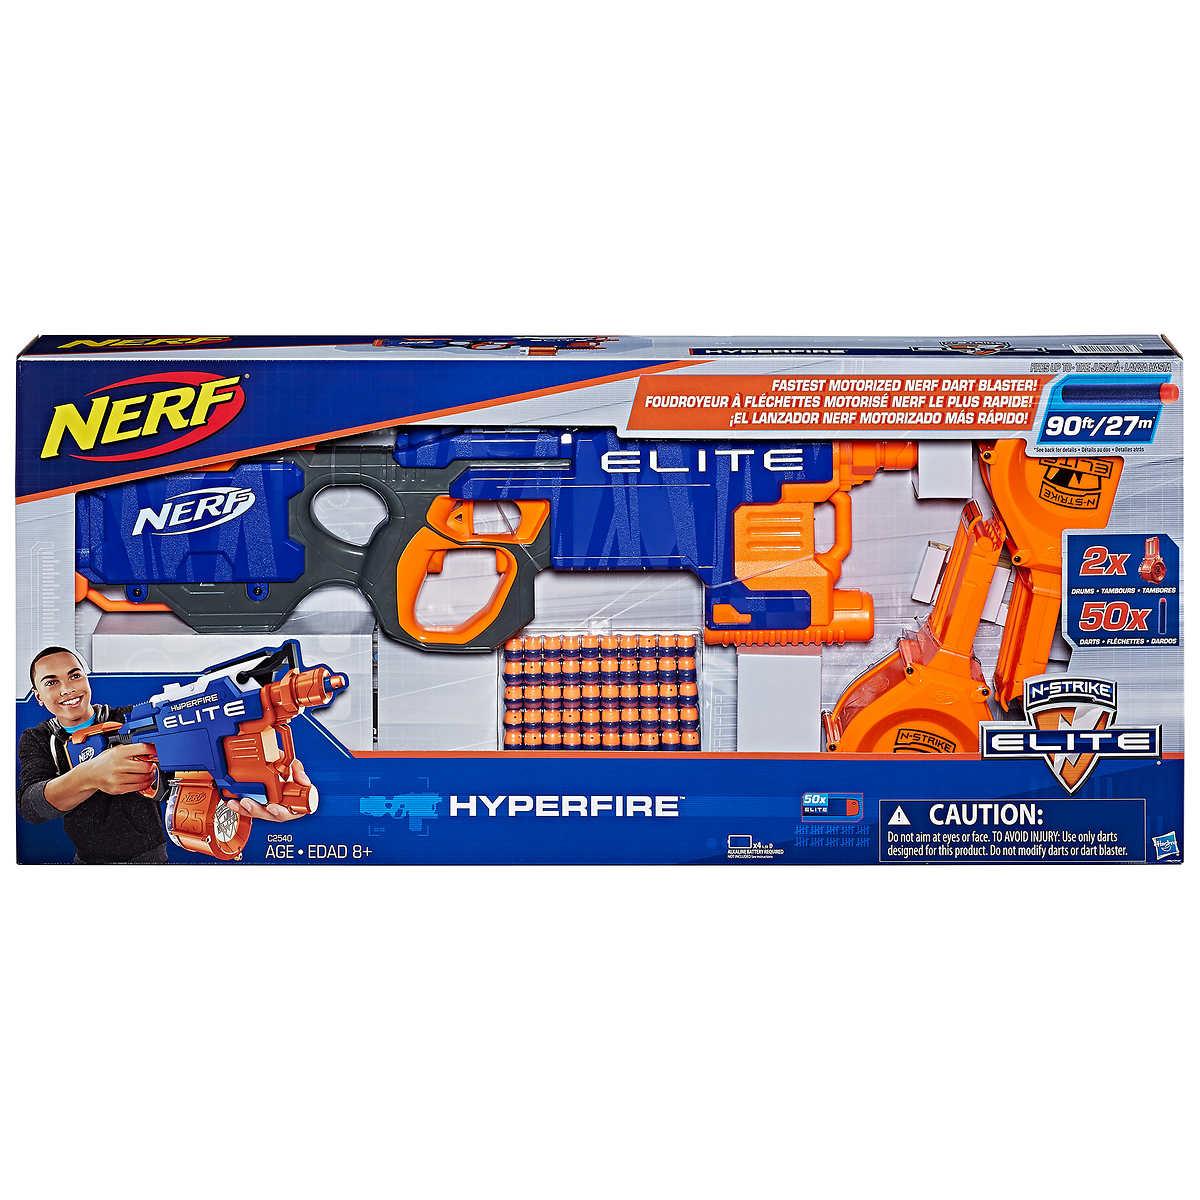 Nerf gun / hyper fire in Ventnor